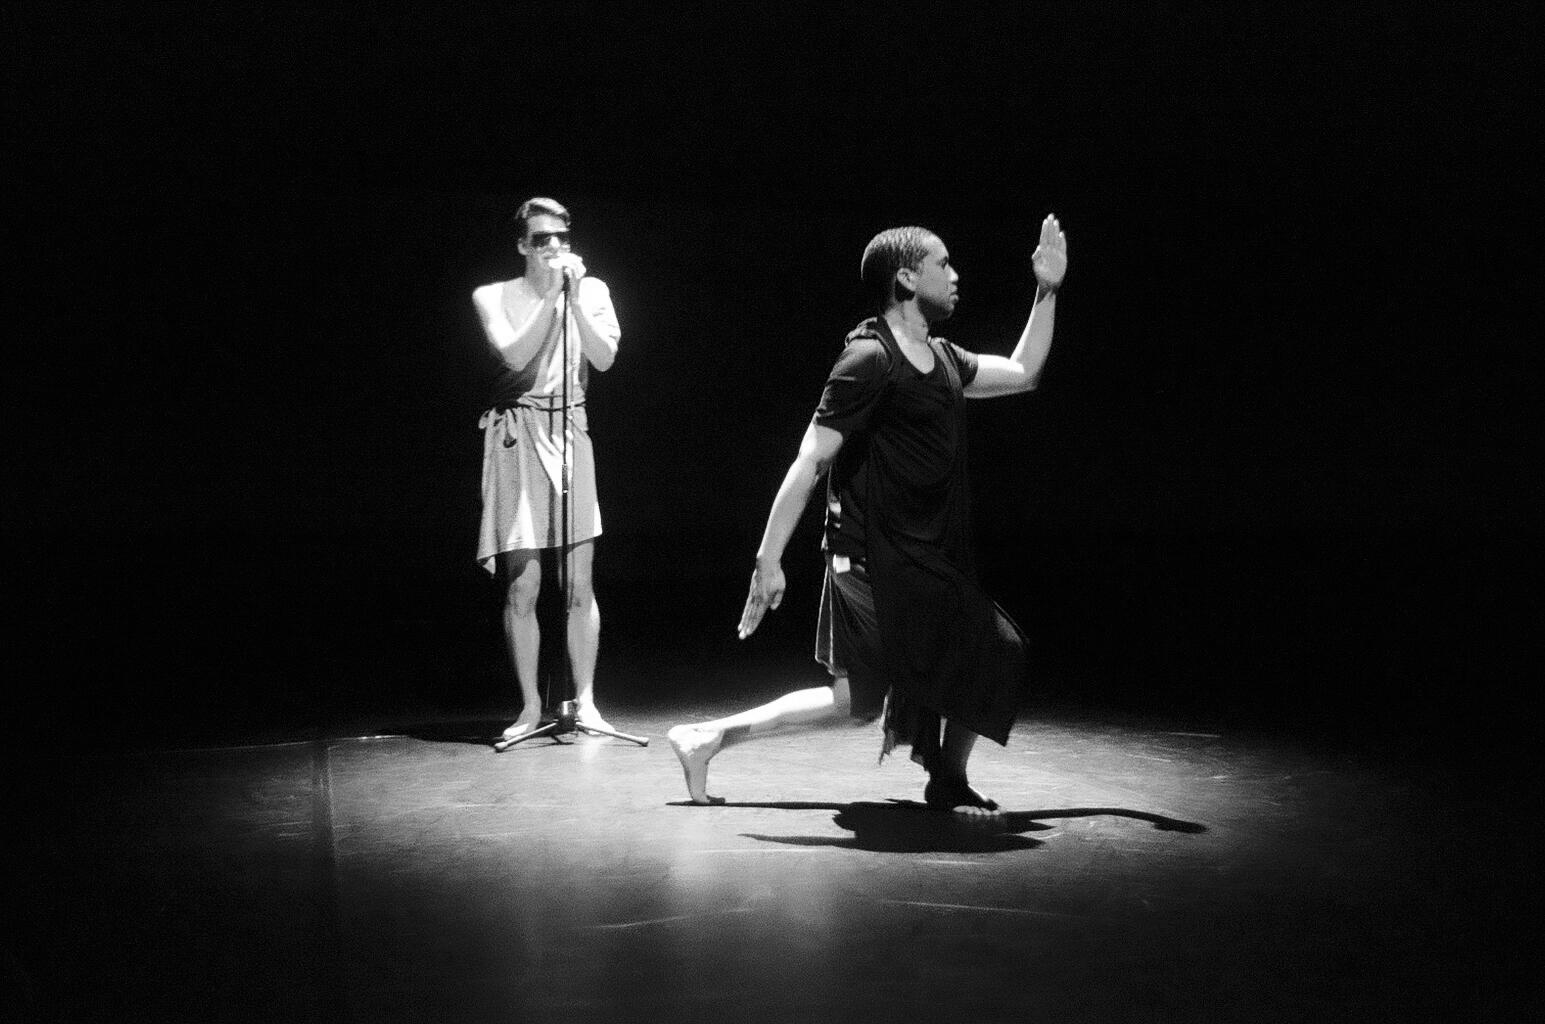 Thibault Lac & Trajal Harrell, Paris, 2016